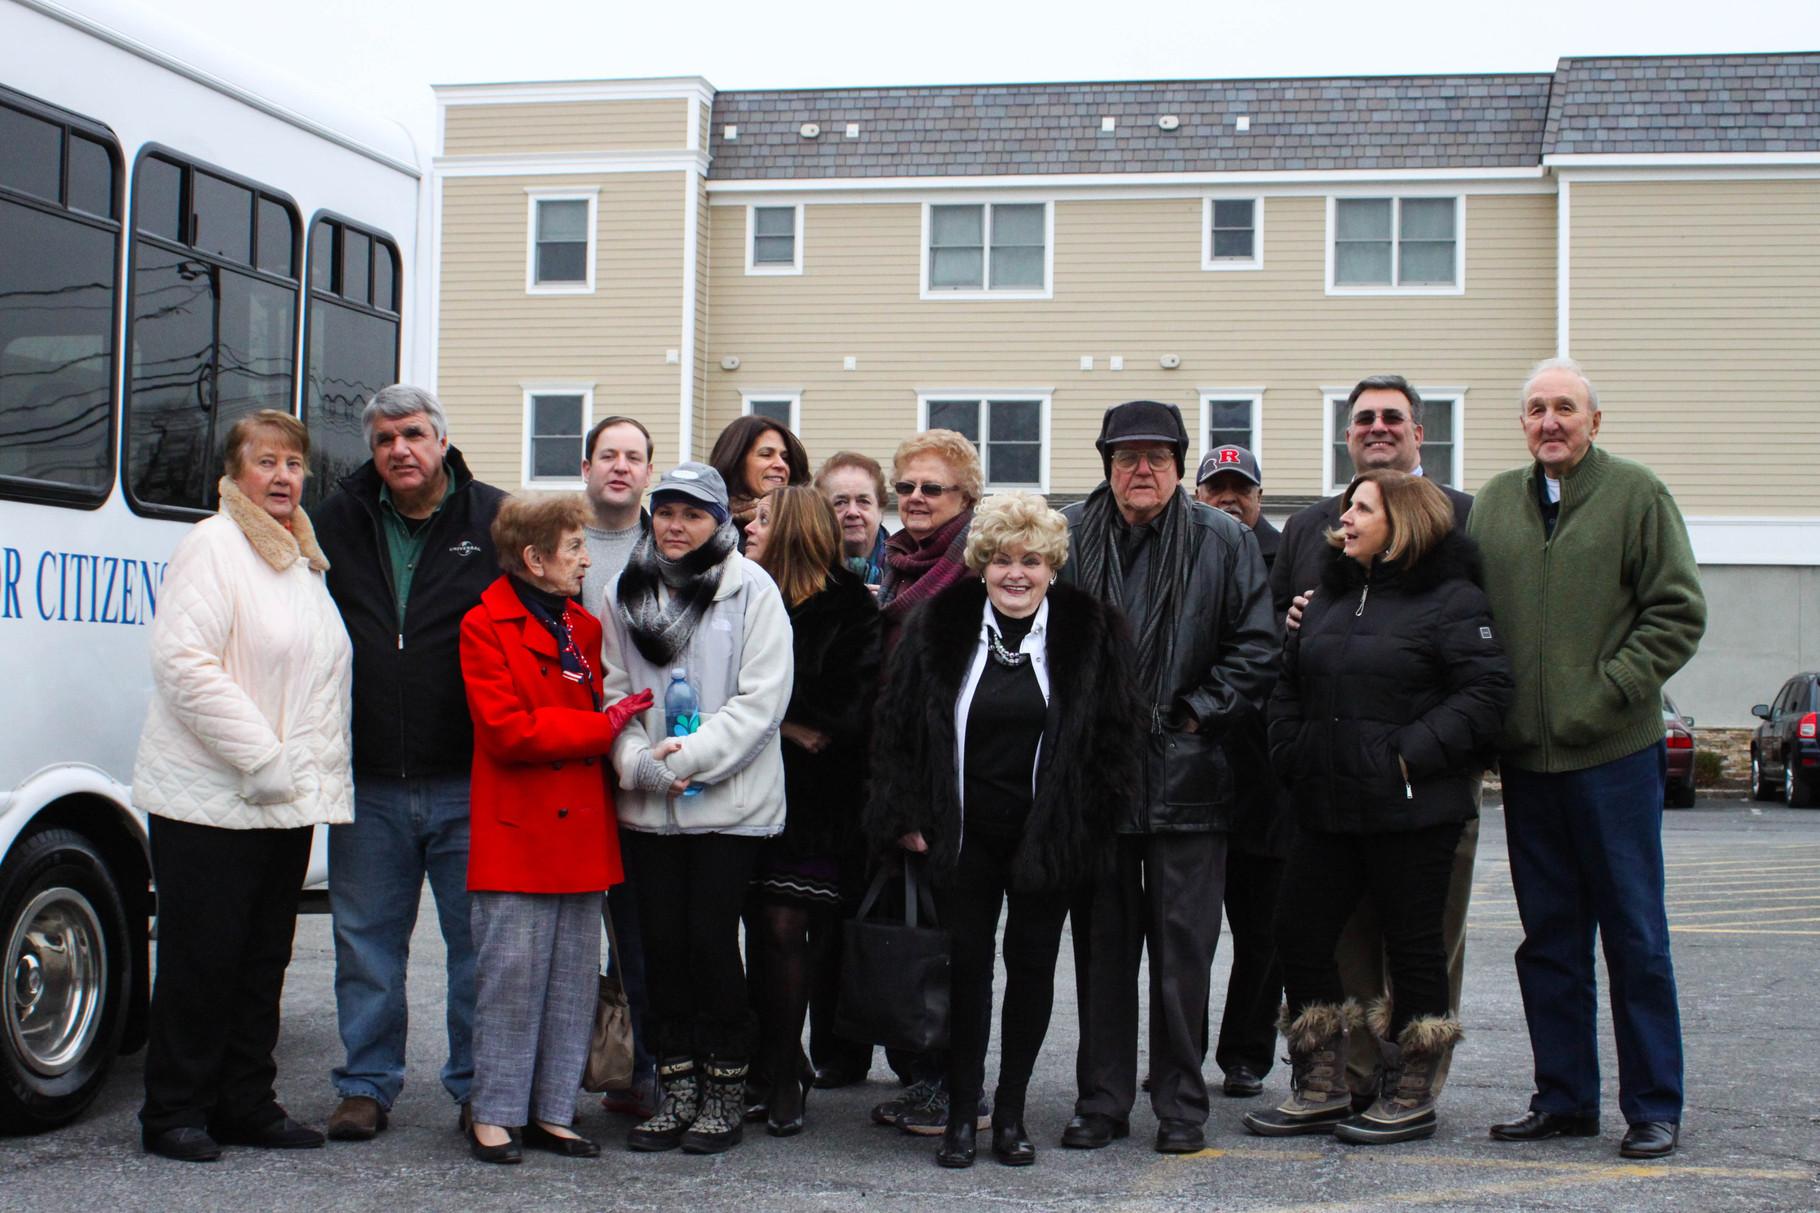 Township officials and senior citizens rejoice